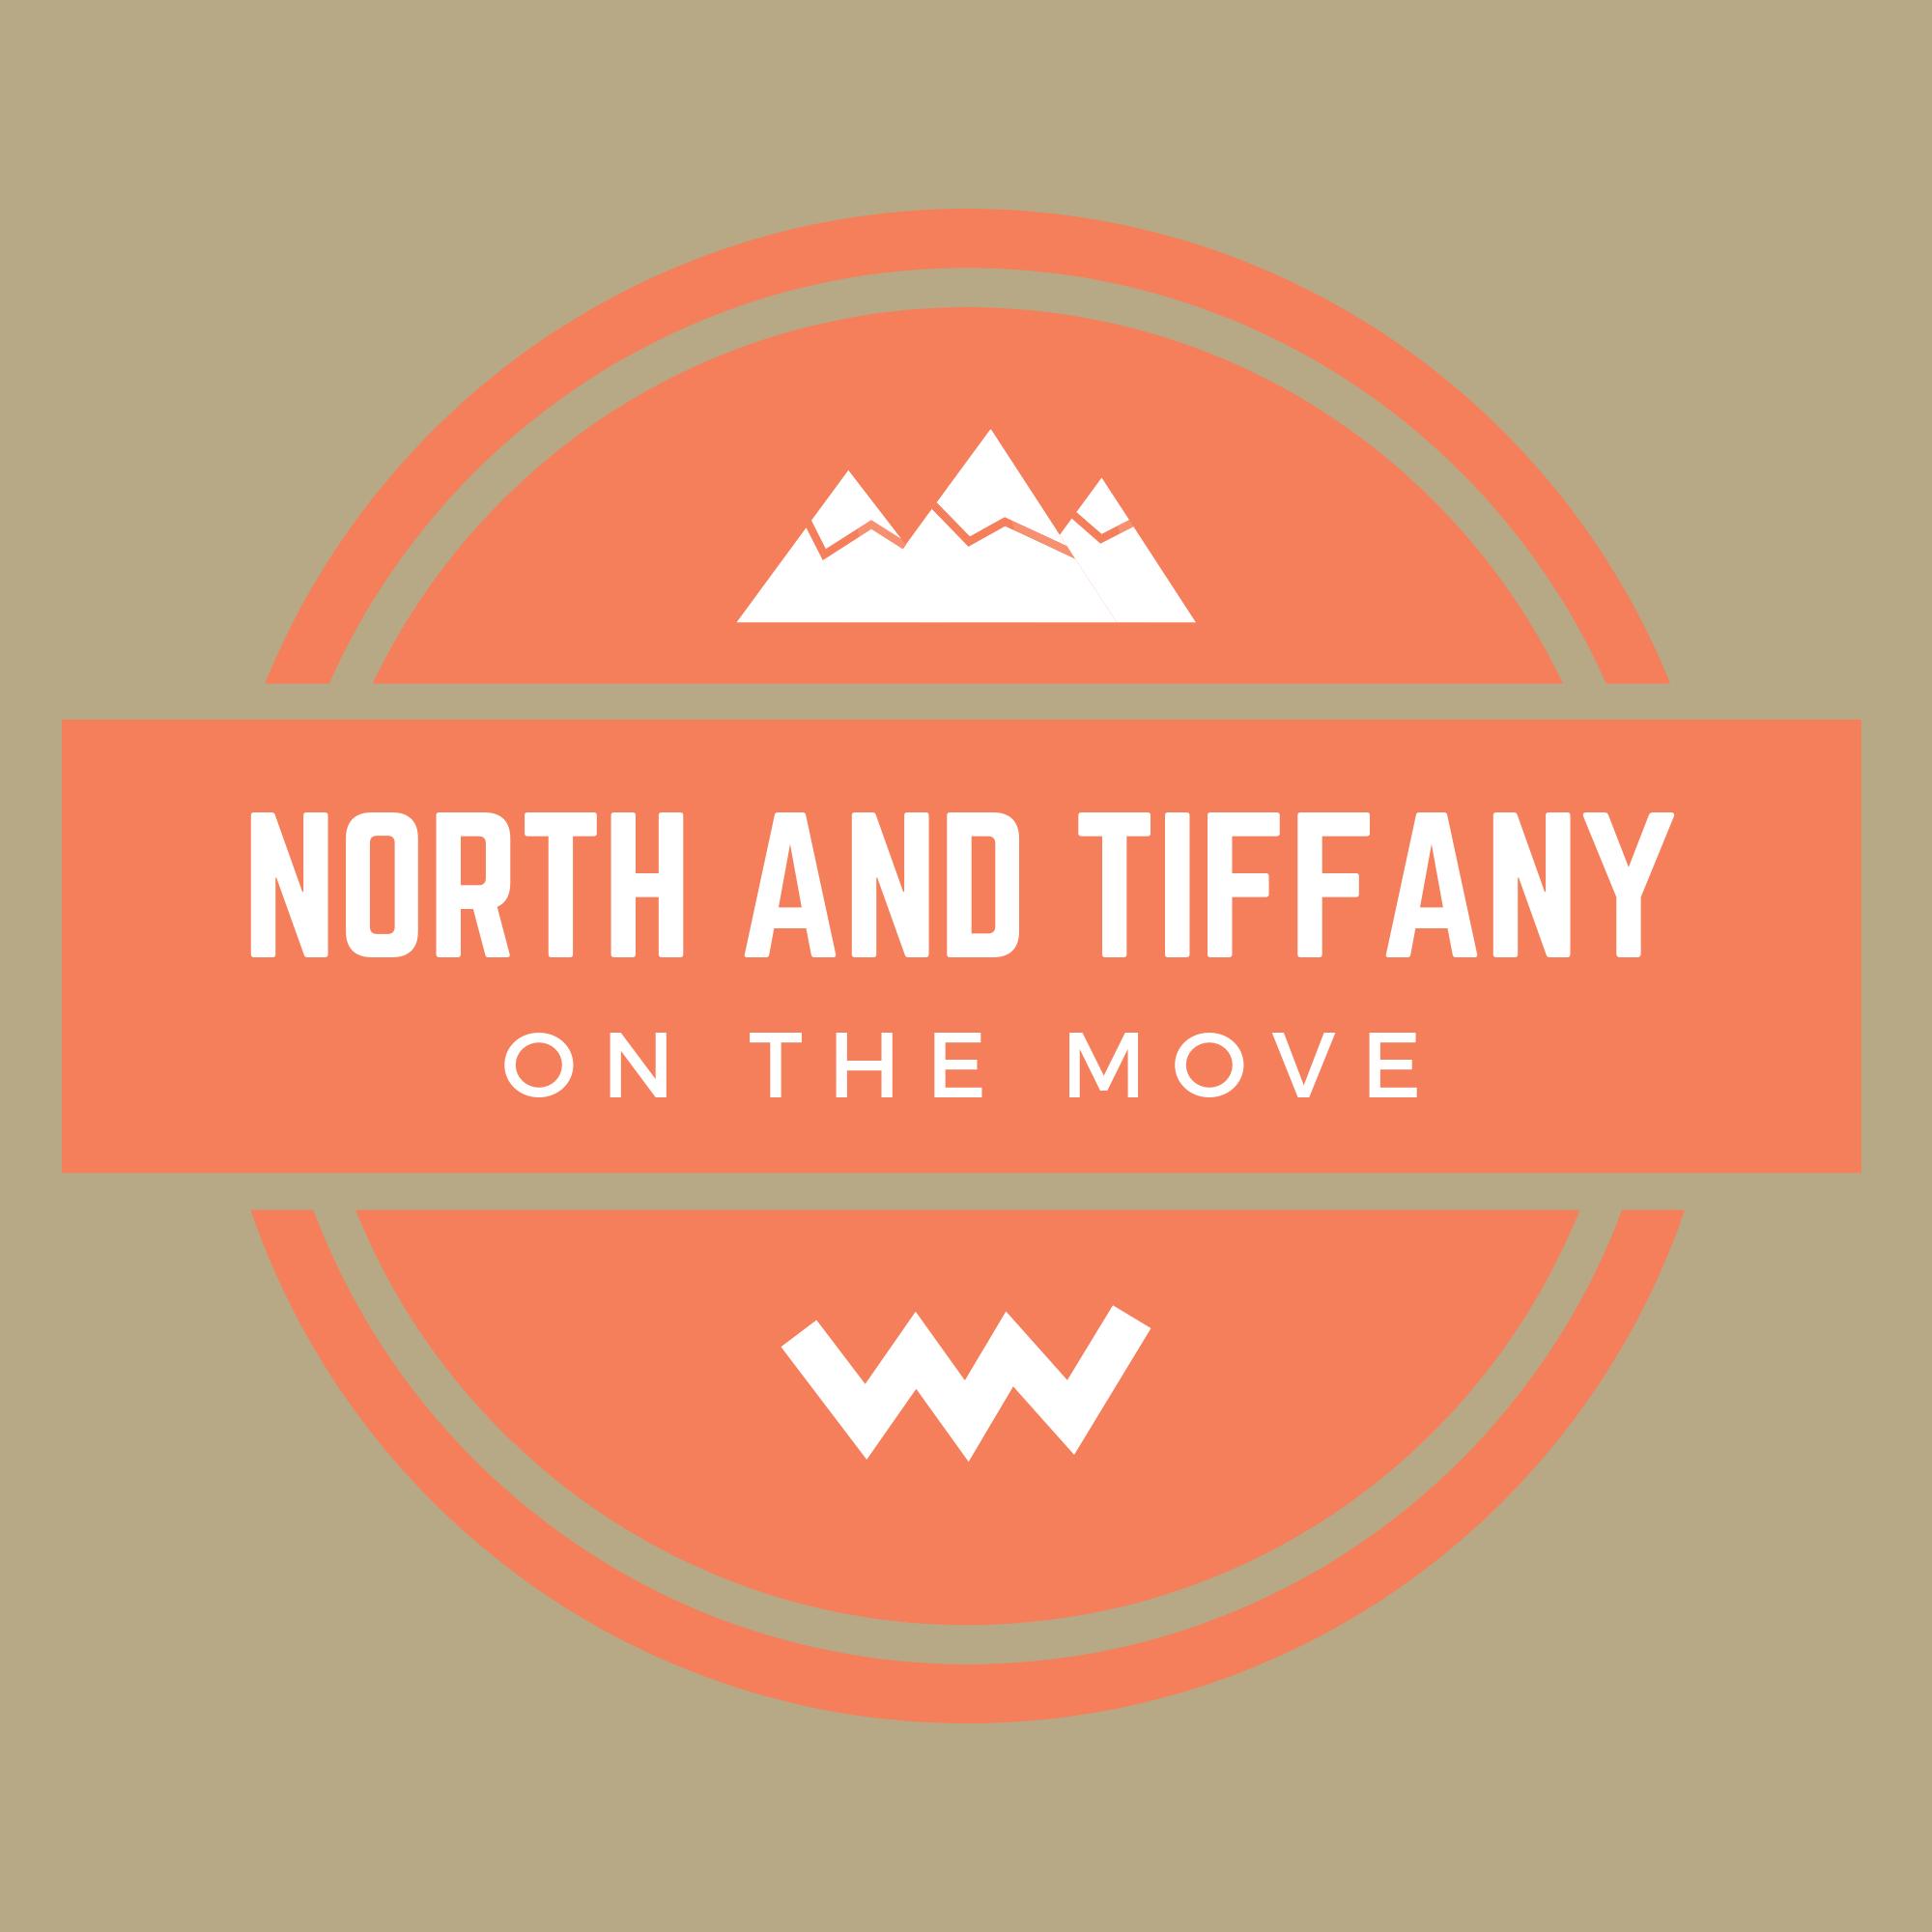 North and Tiffany On the Move | Black Millennials Living Van Life